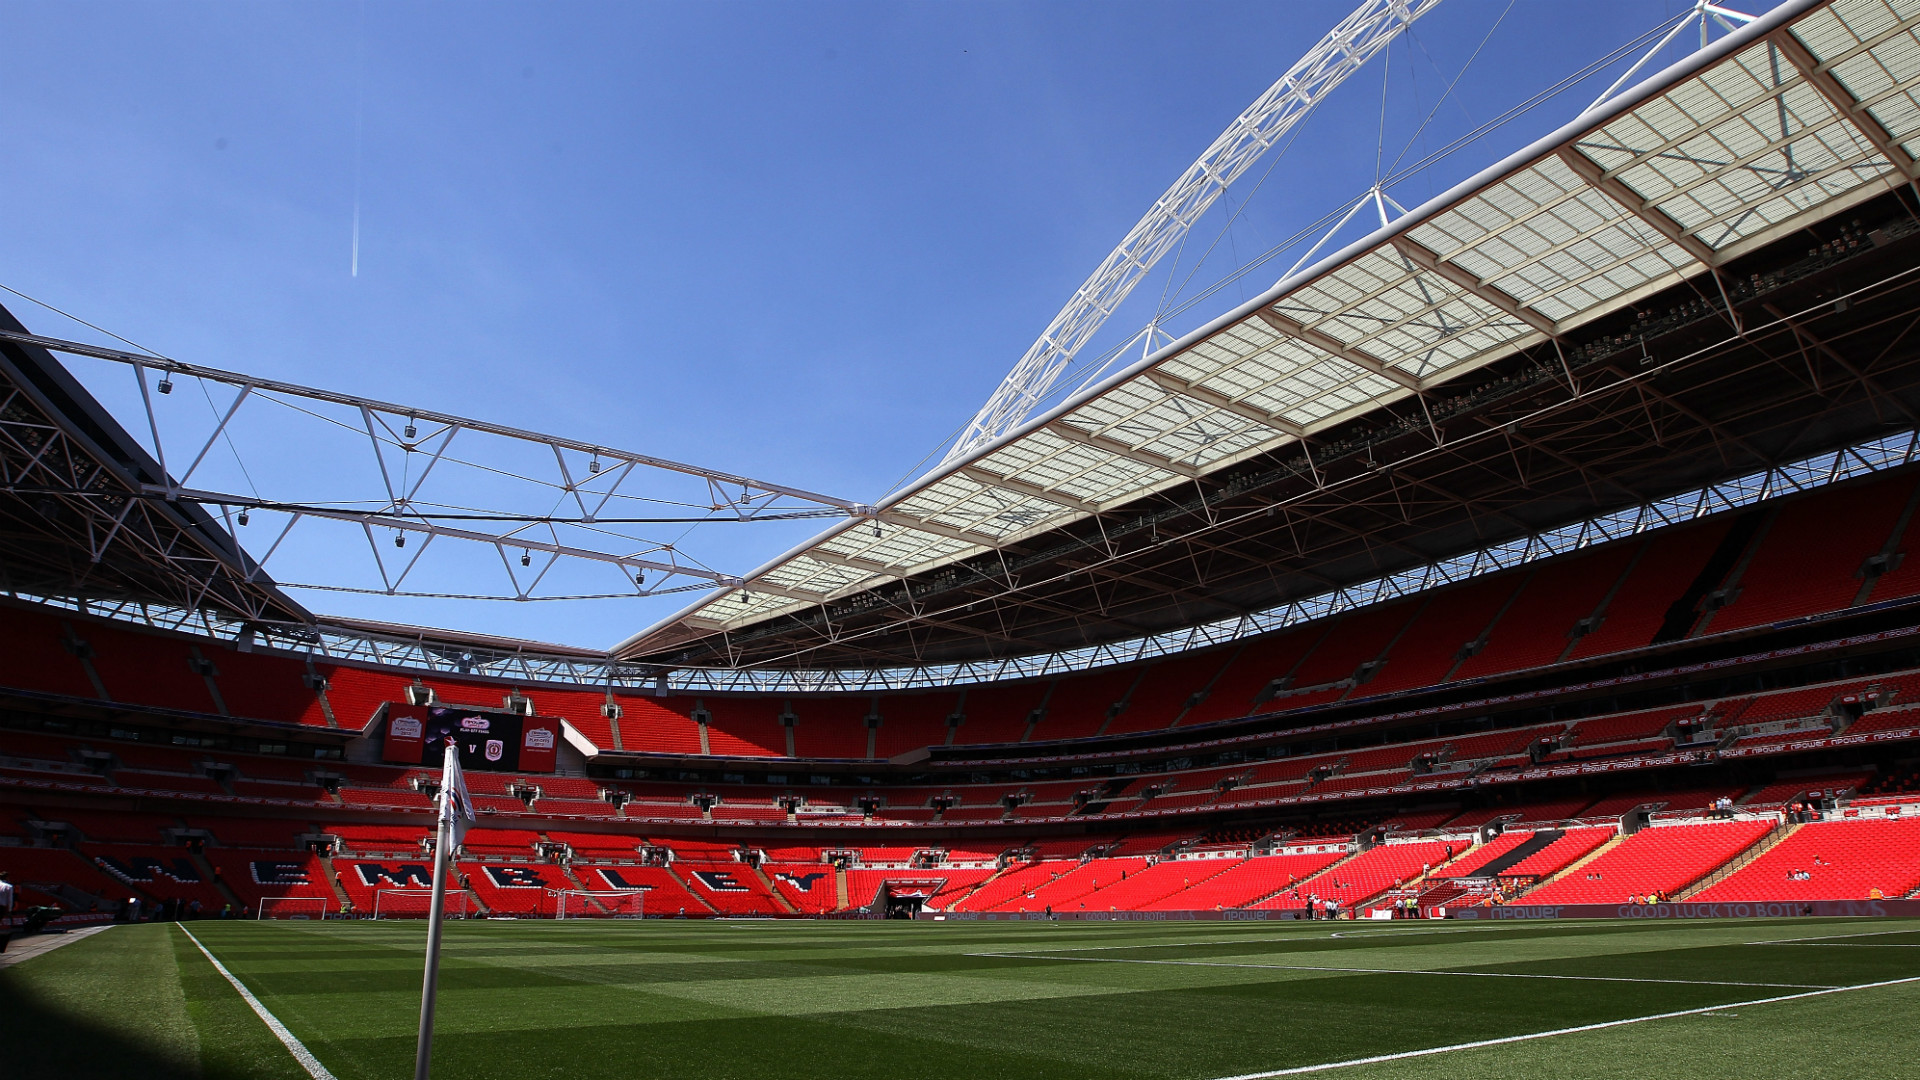 National Hockey League  owner submits £800m bid to buy Wembley Stadium